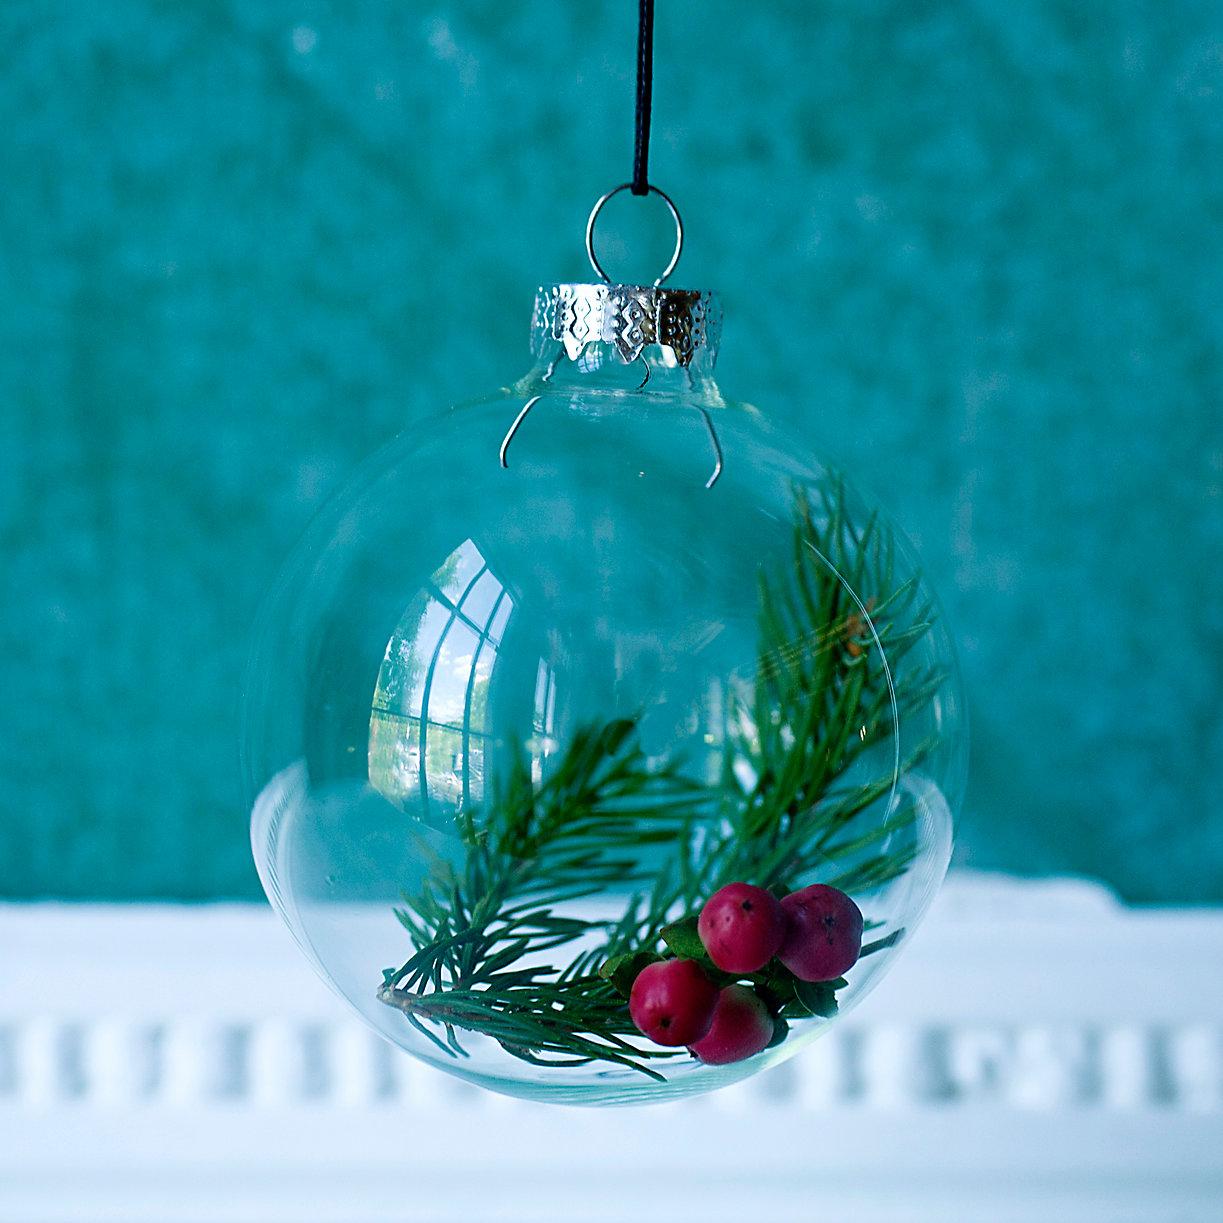 Fillable Glass Ornament Terrain : 32823502000azoom2 from www.shopterrain.com size 1223 x 1223 jpeg 229kB